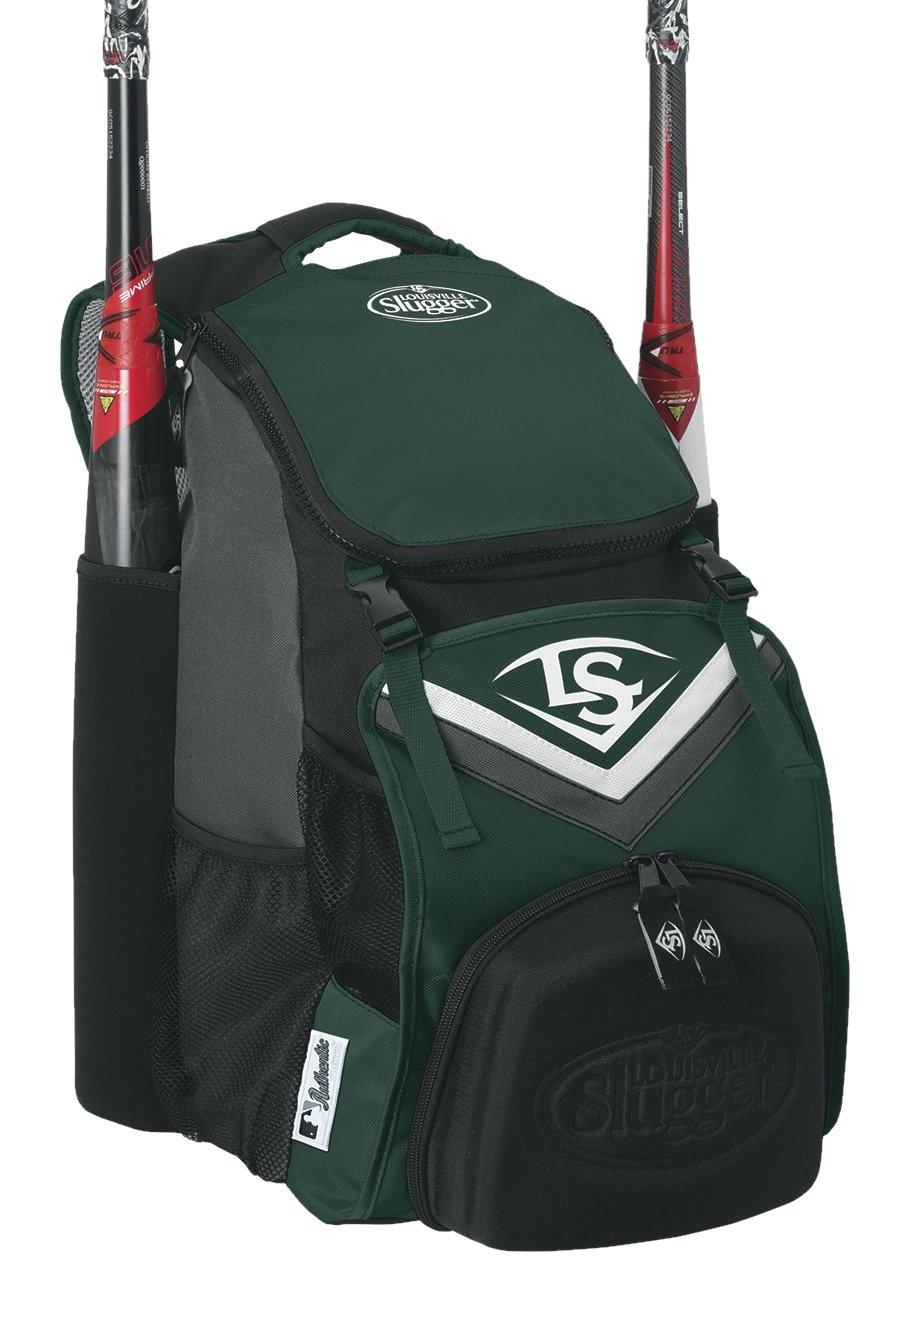 baseball bat bag softball equipment backpack tote